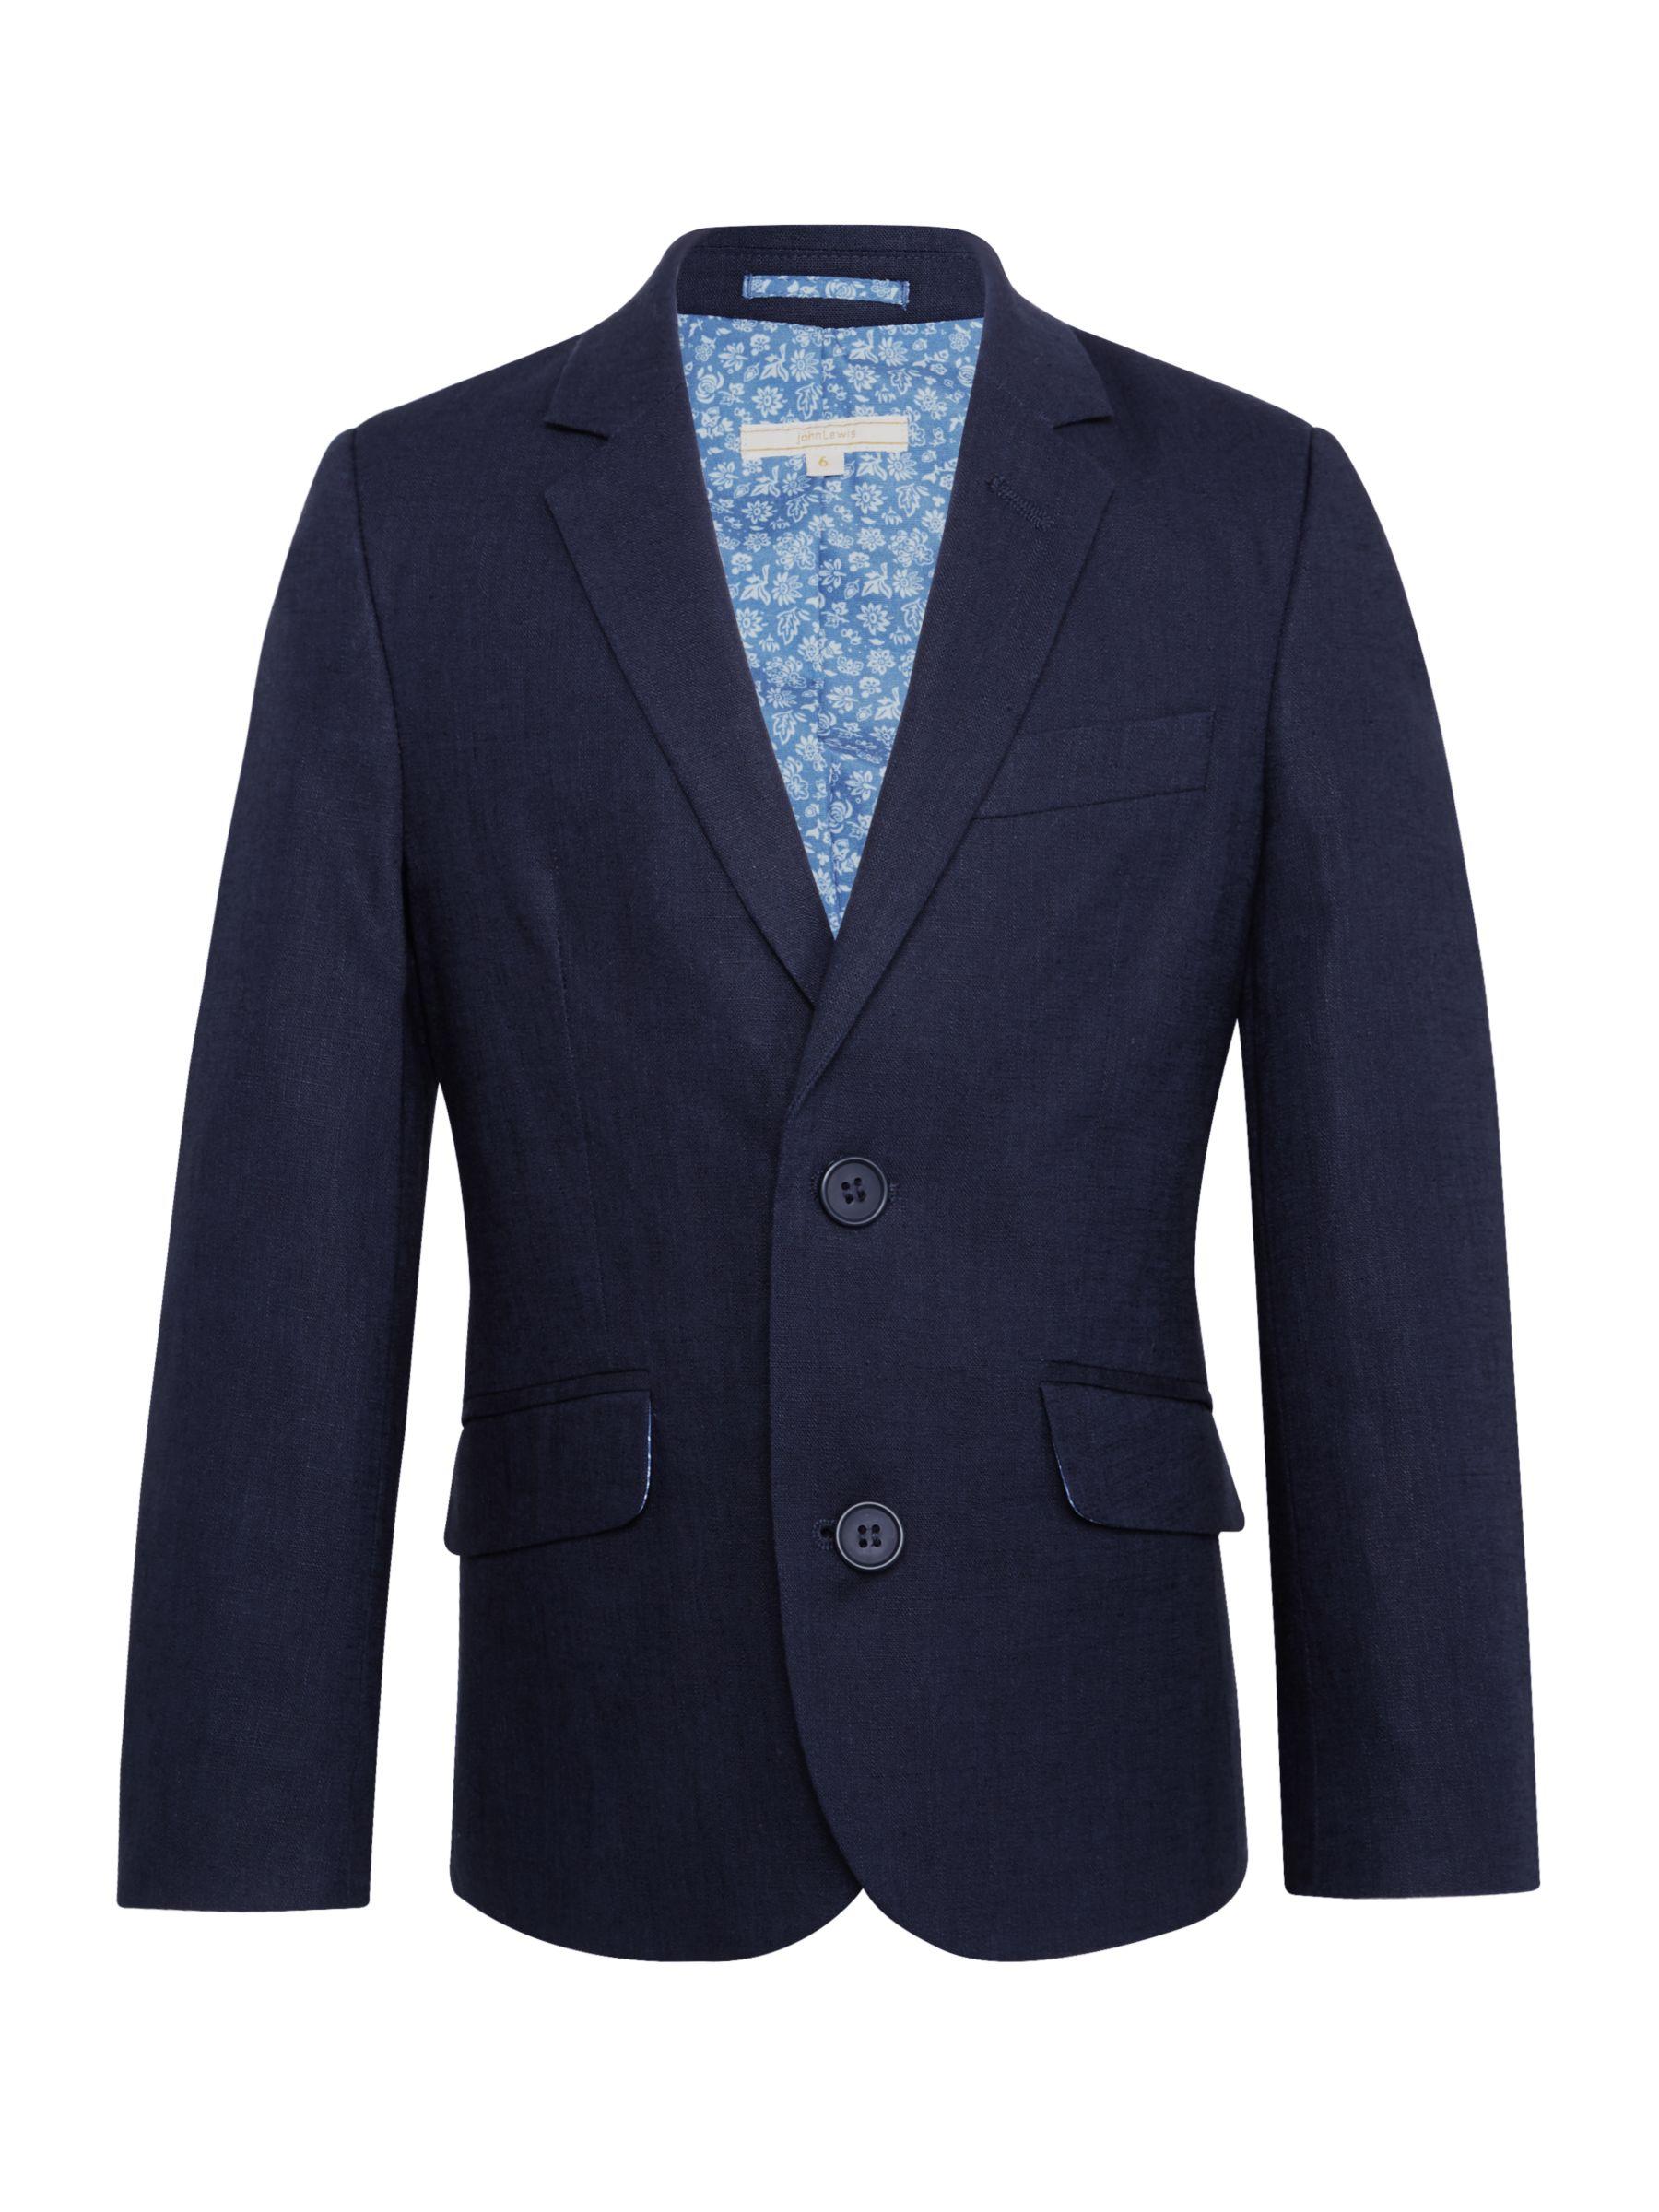 John Lewis Heirloom Collection John Lewis Heirloom Collection Boys' Linen Cotton Jacket